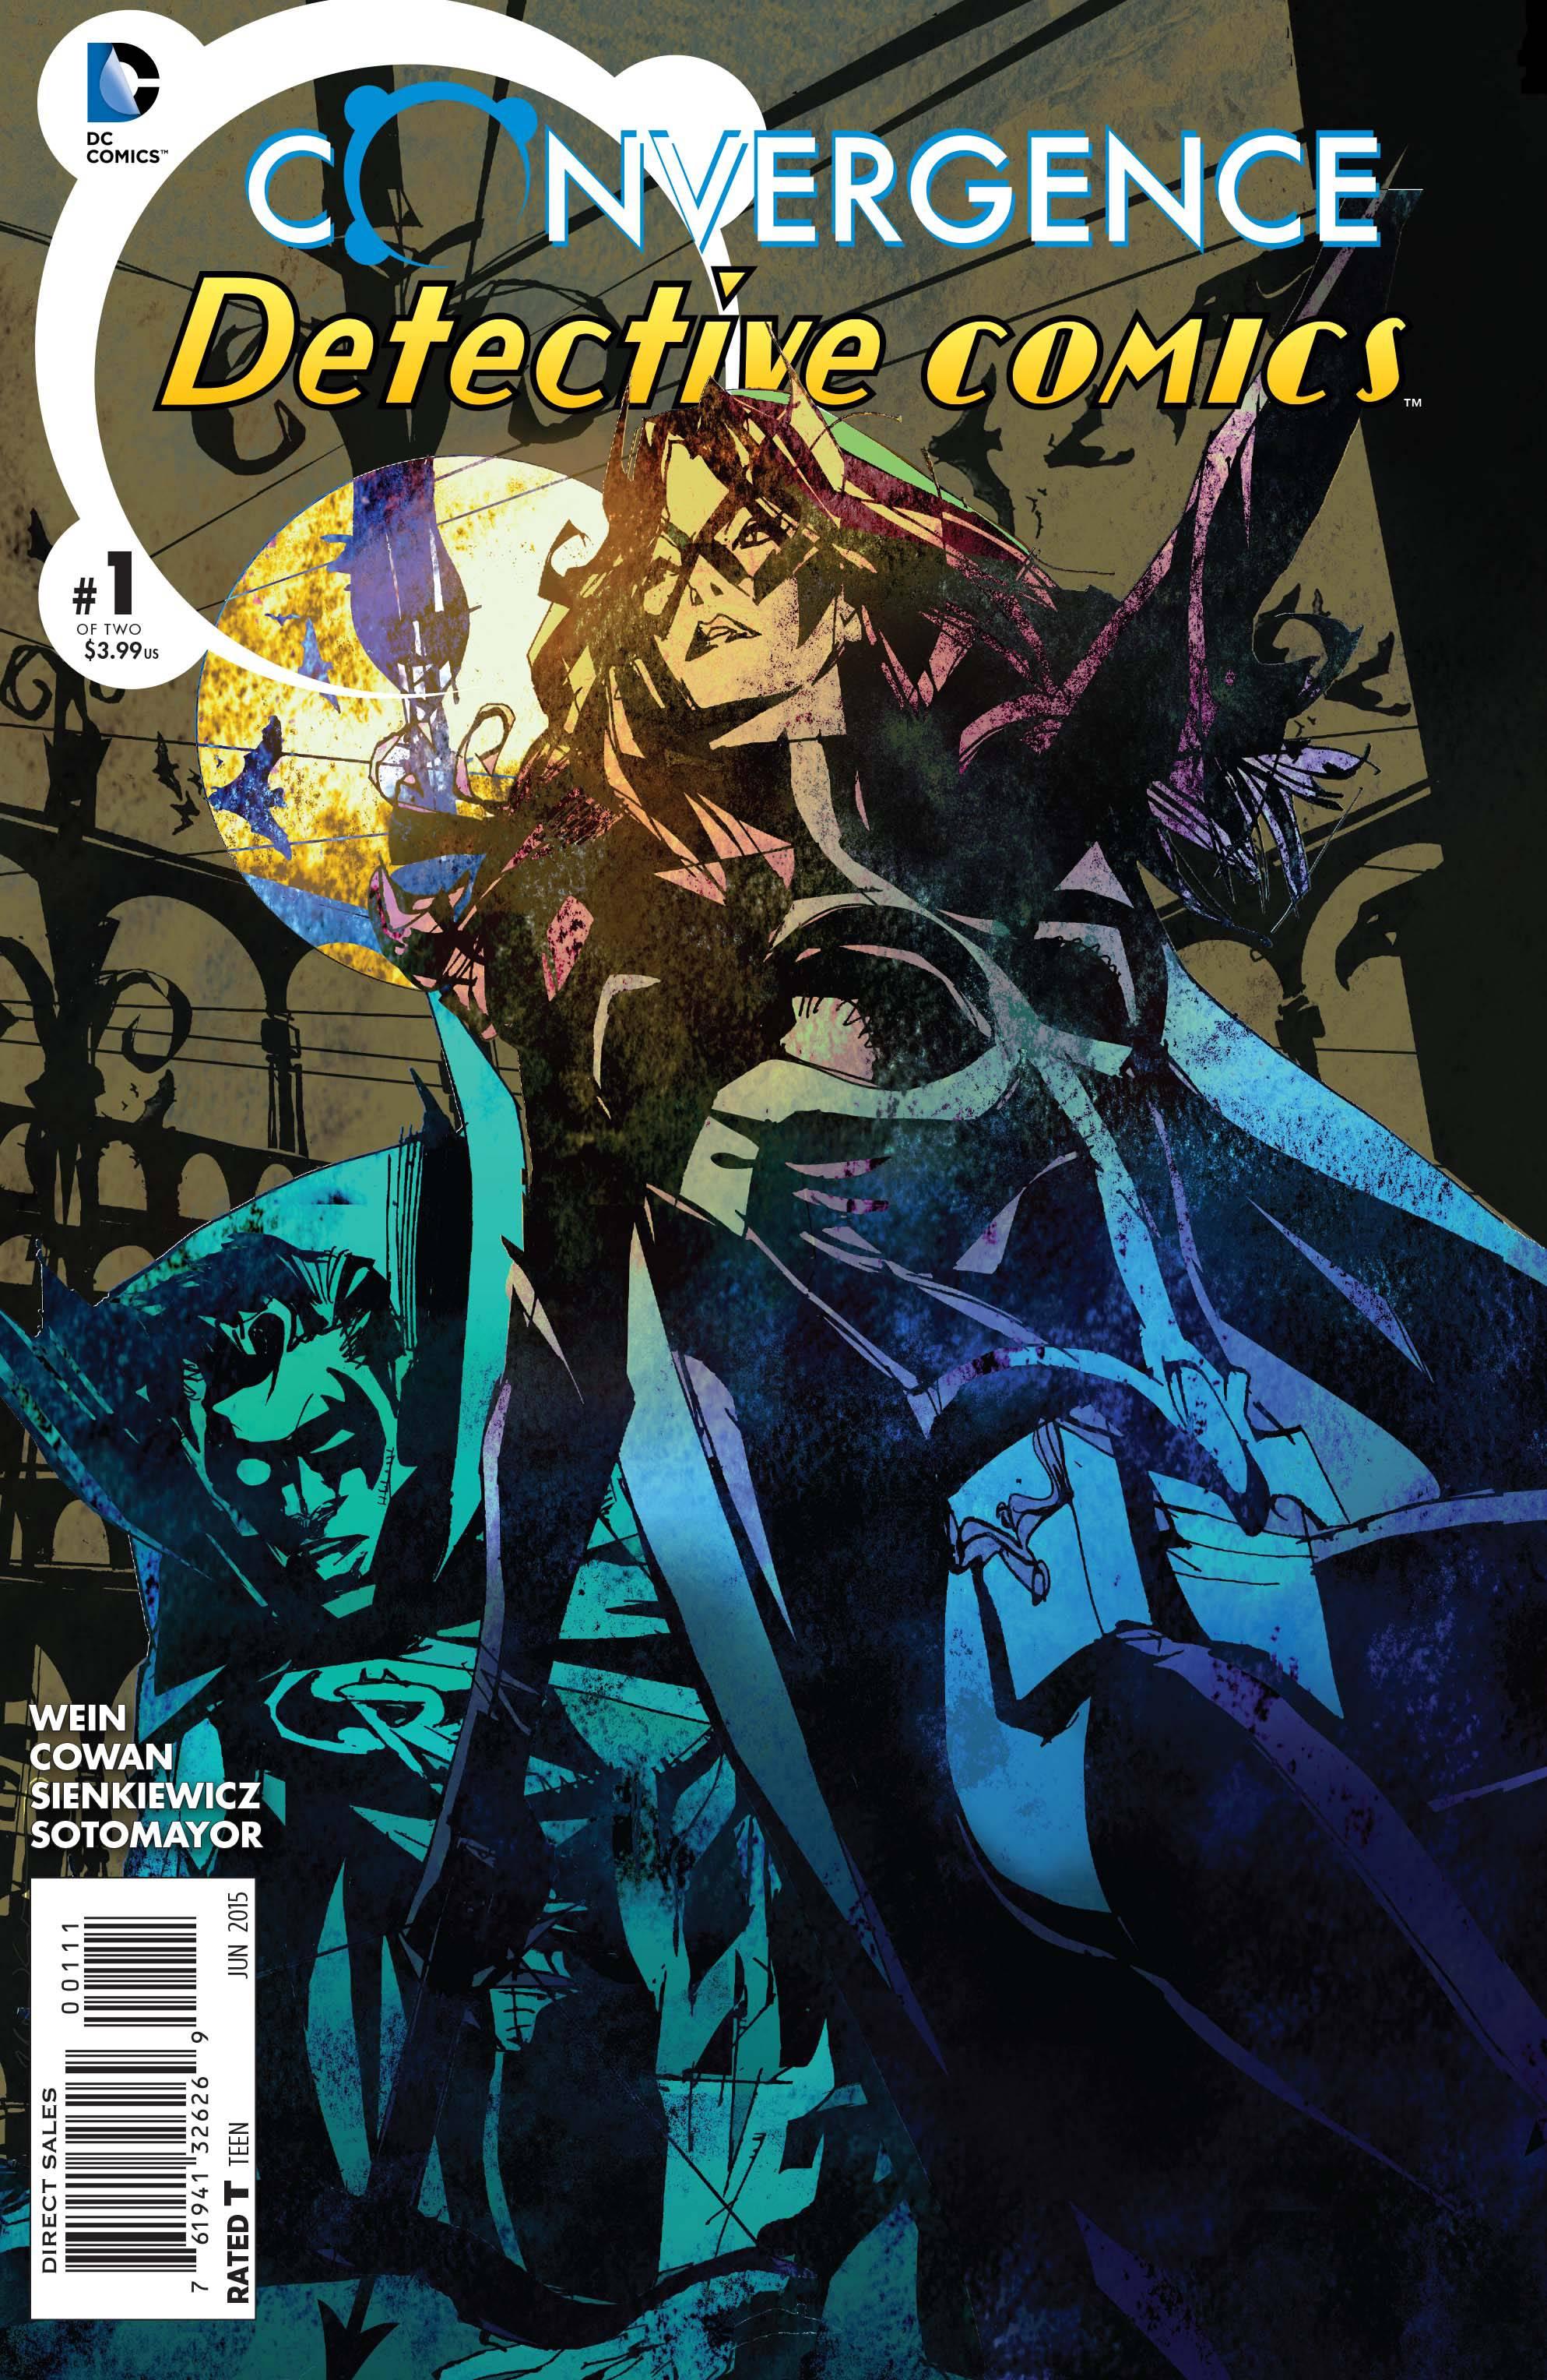 Convergence Detective Comics #1